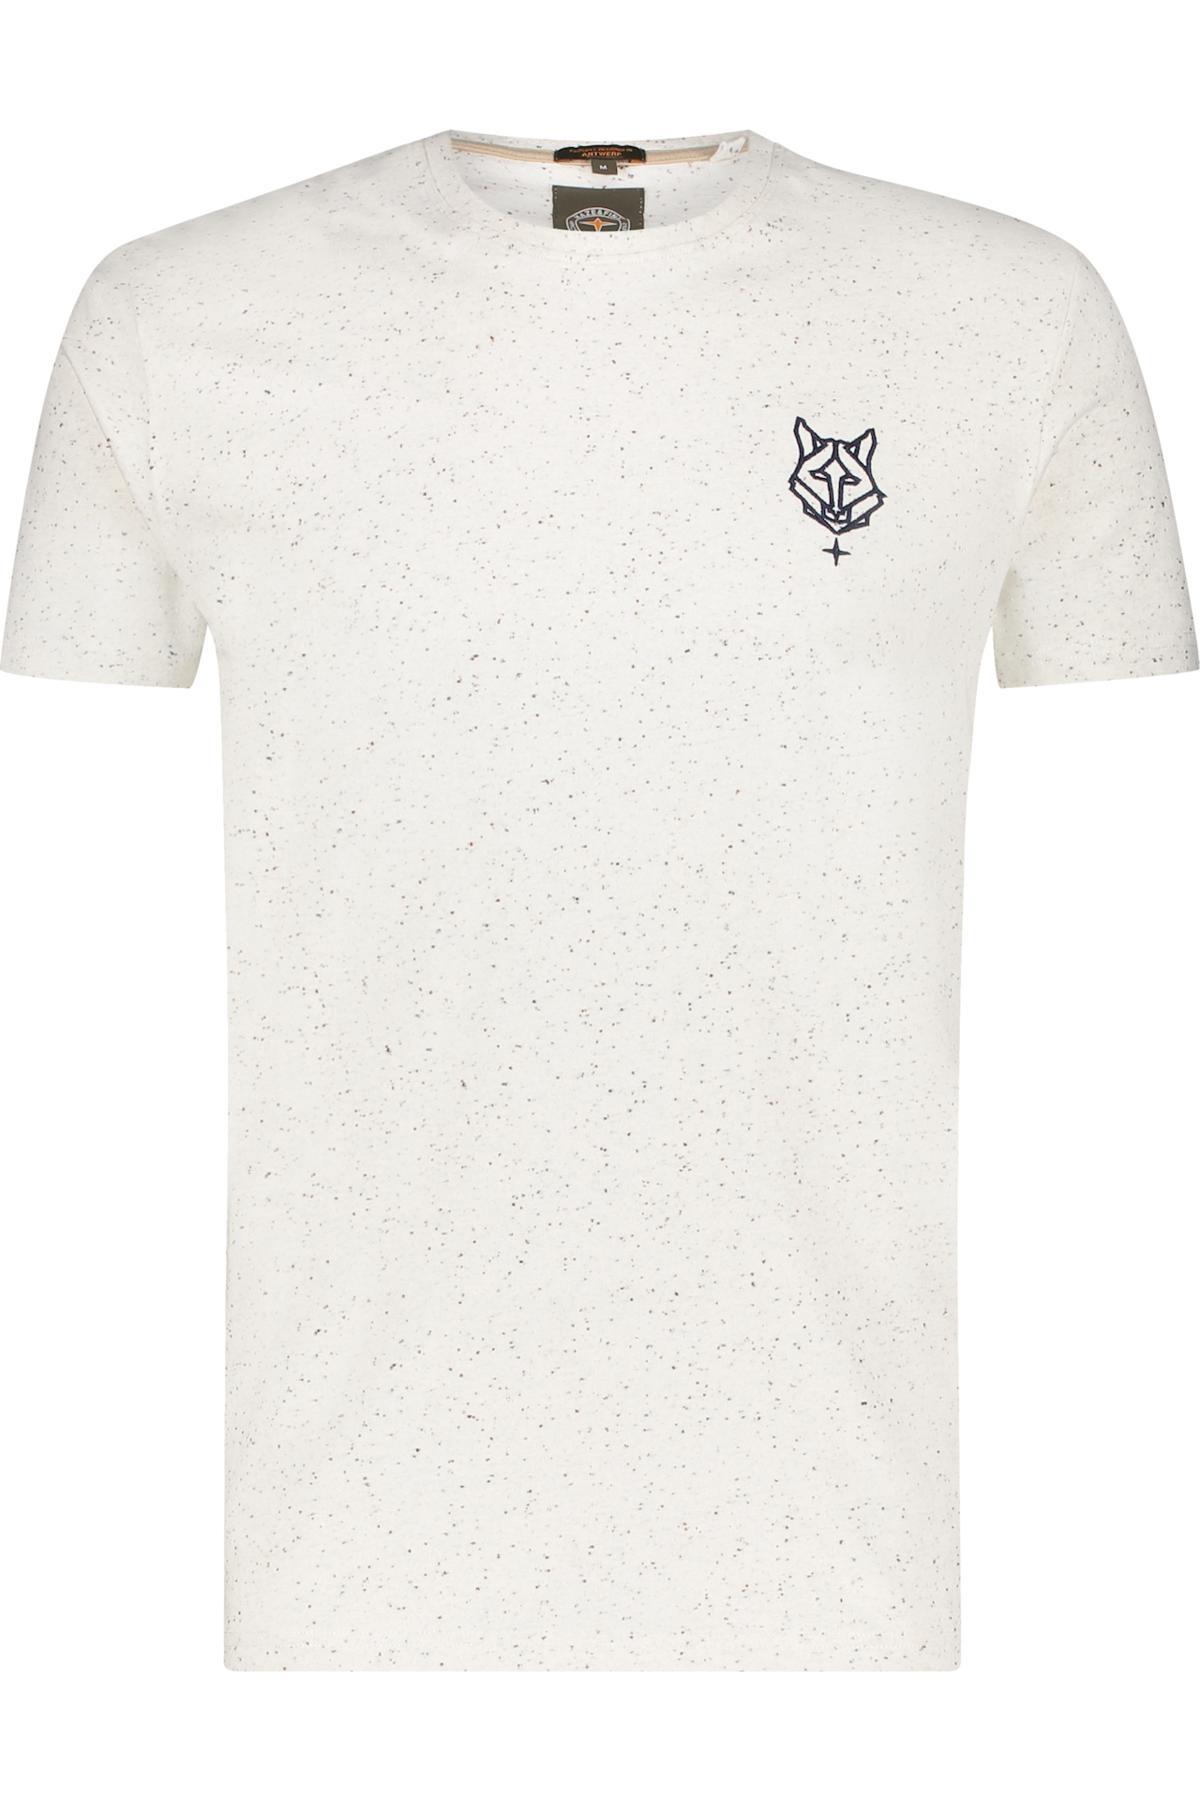 T-Shirts - Husky Embro-1